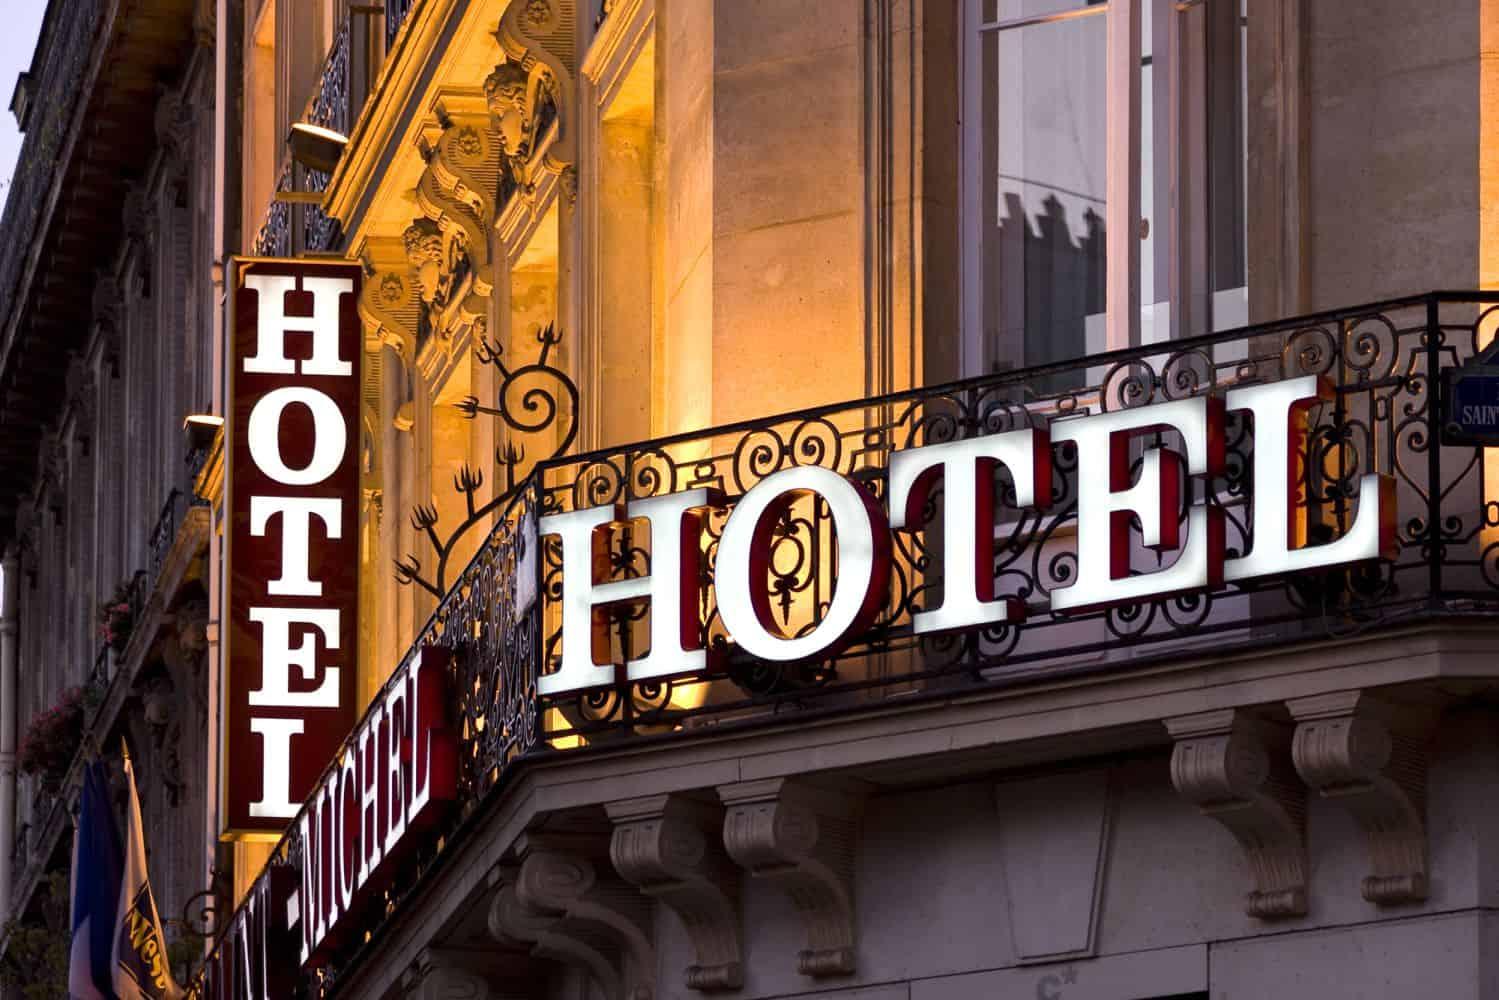 Paris Ratgeber Hotel Frankreich